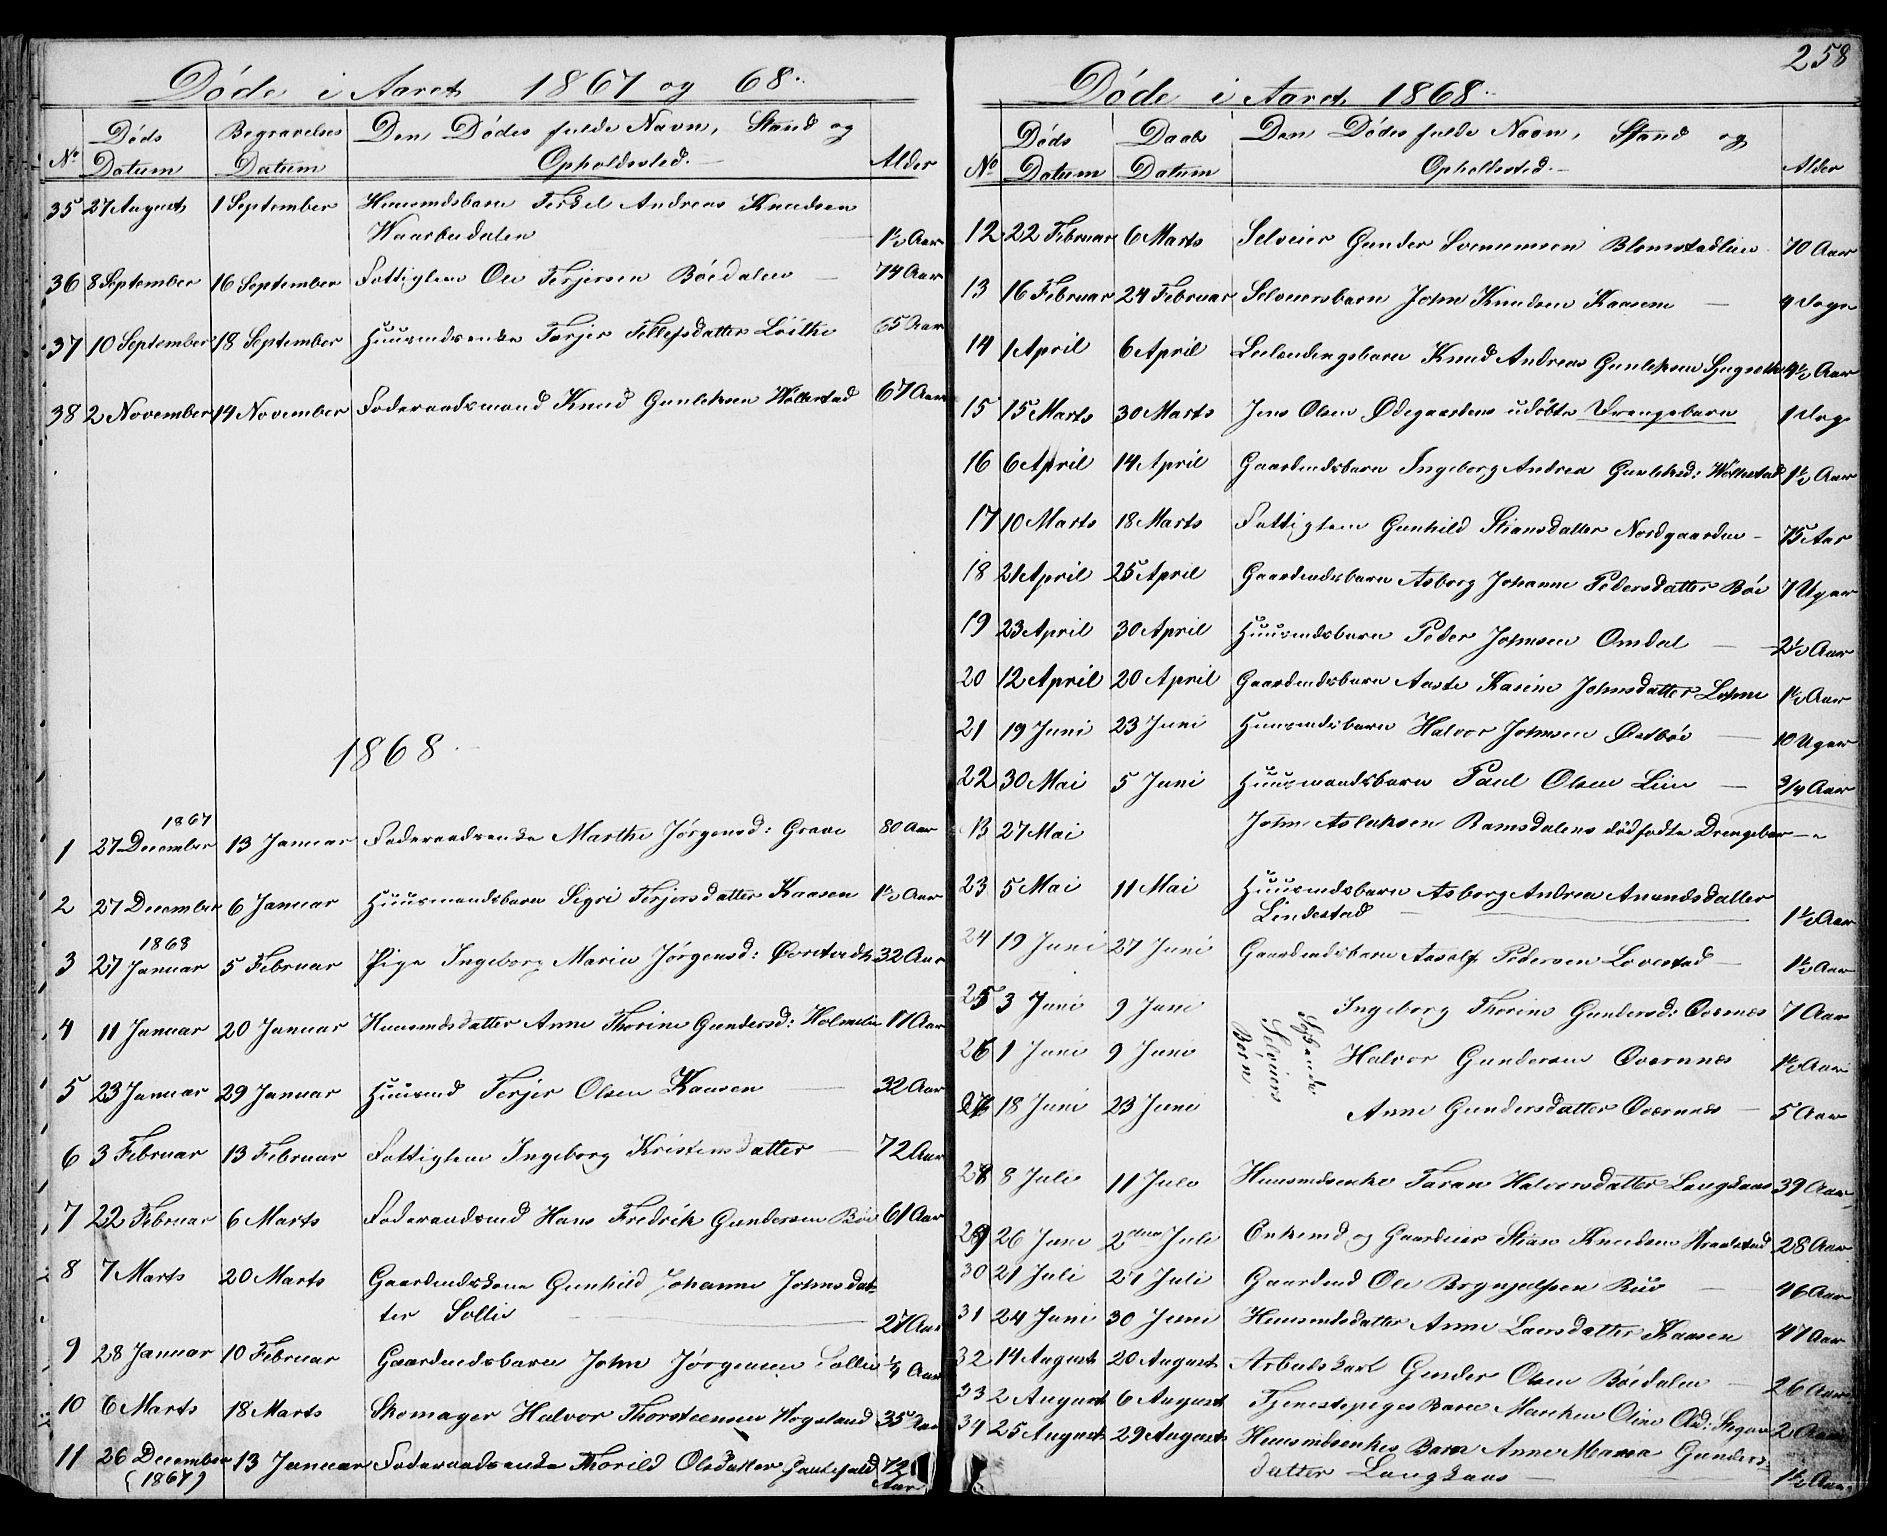 SAKO, Drangedal kirkebøker, G/Gb/L0001: Klokkerbok nr. II 1, 1856-1894, s. 258